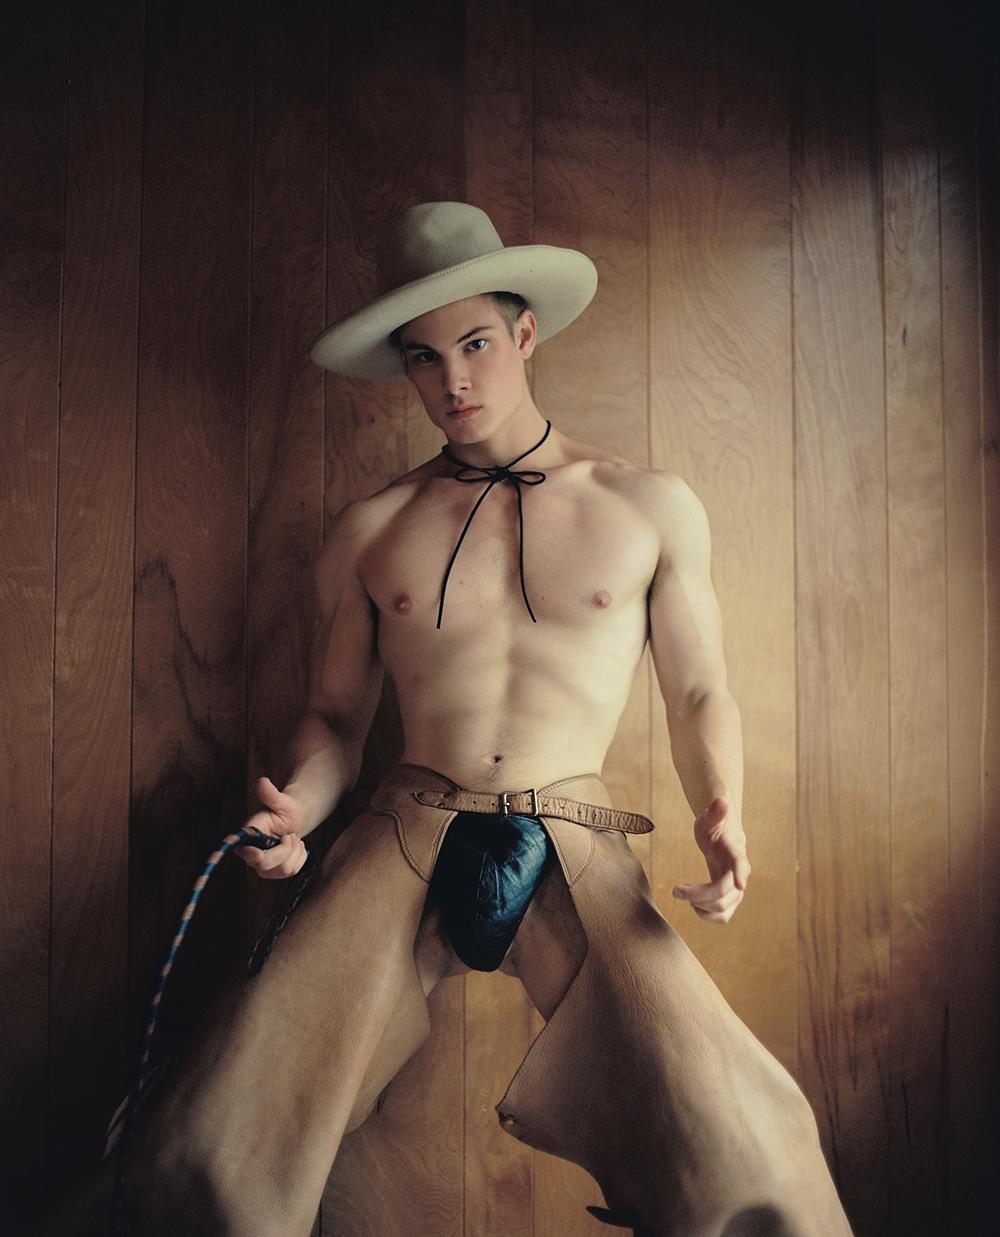 LUKE SMITHERS Cowboy, 2015